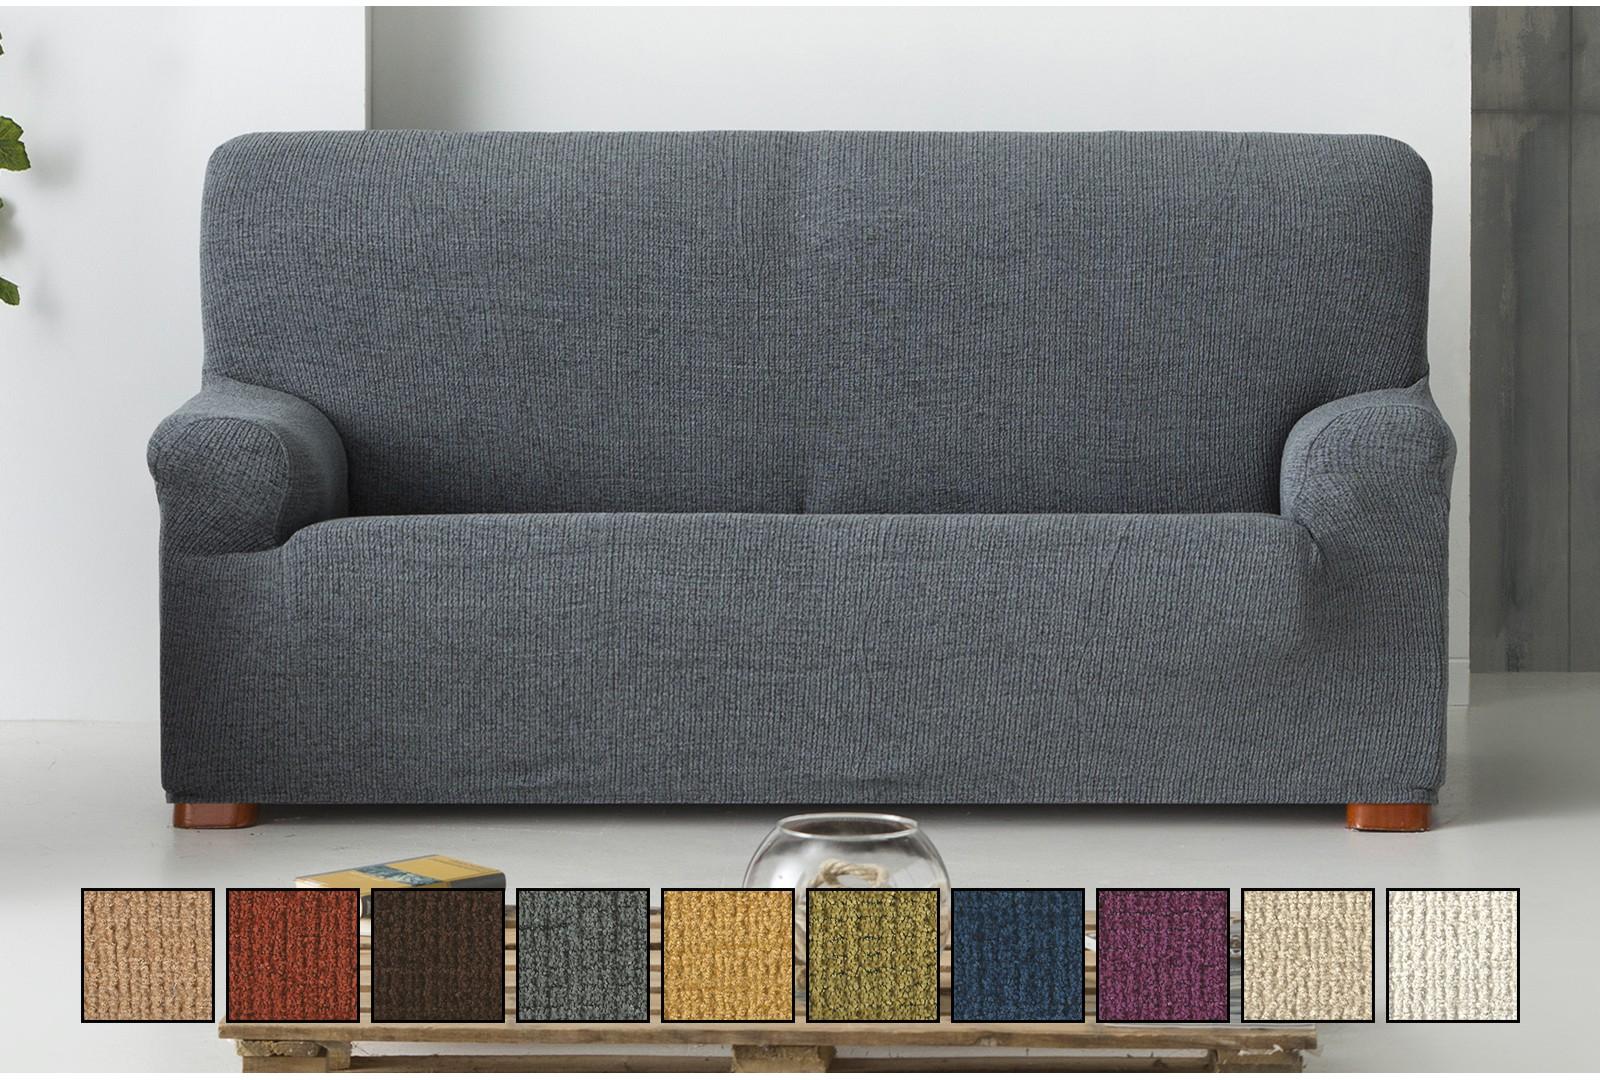 Fundas De sofa Ajustables Ikea 3ldq Fundas De sofà Elà Sticas Y Bielà Sticas Decorajoven